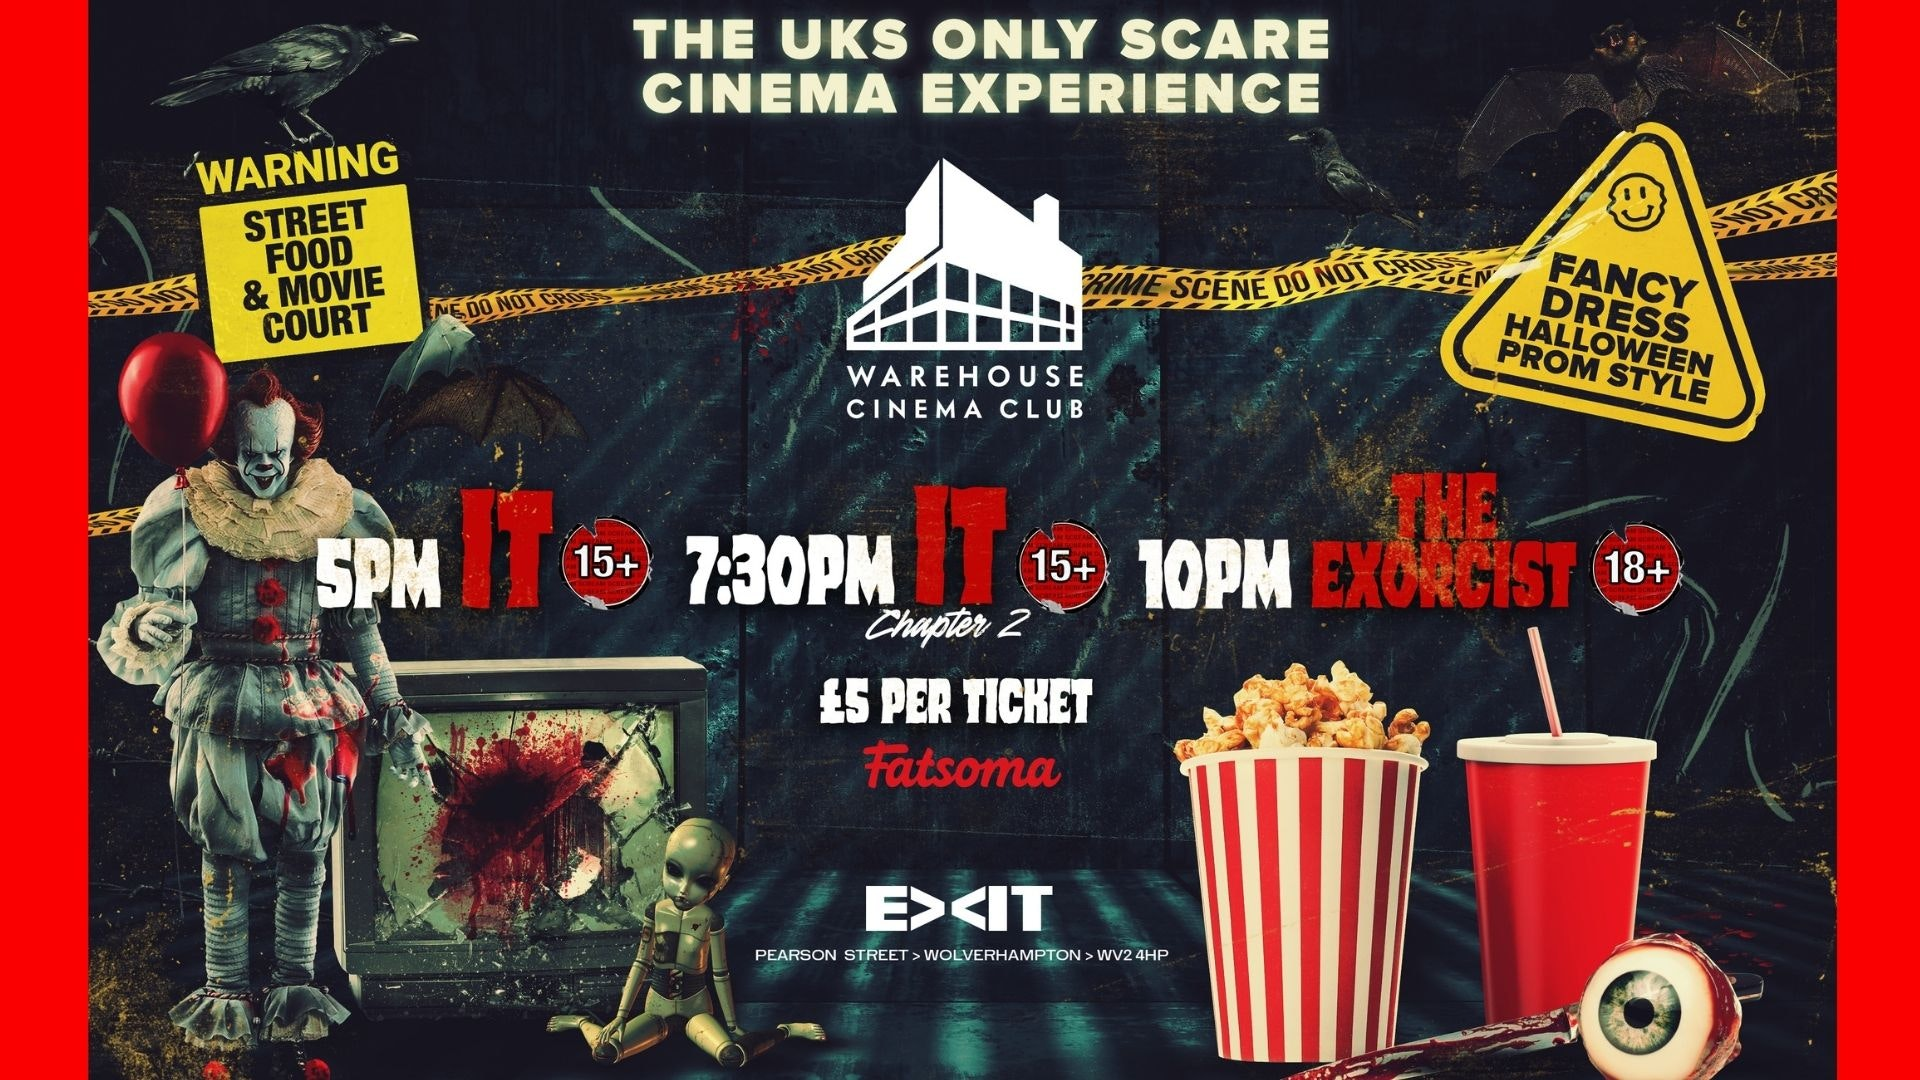 Warehouse Cinema Club Presents The Halloween Warehouse Cinema Experience